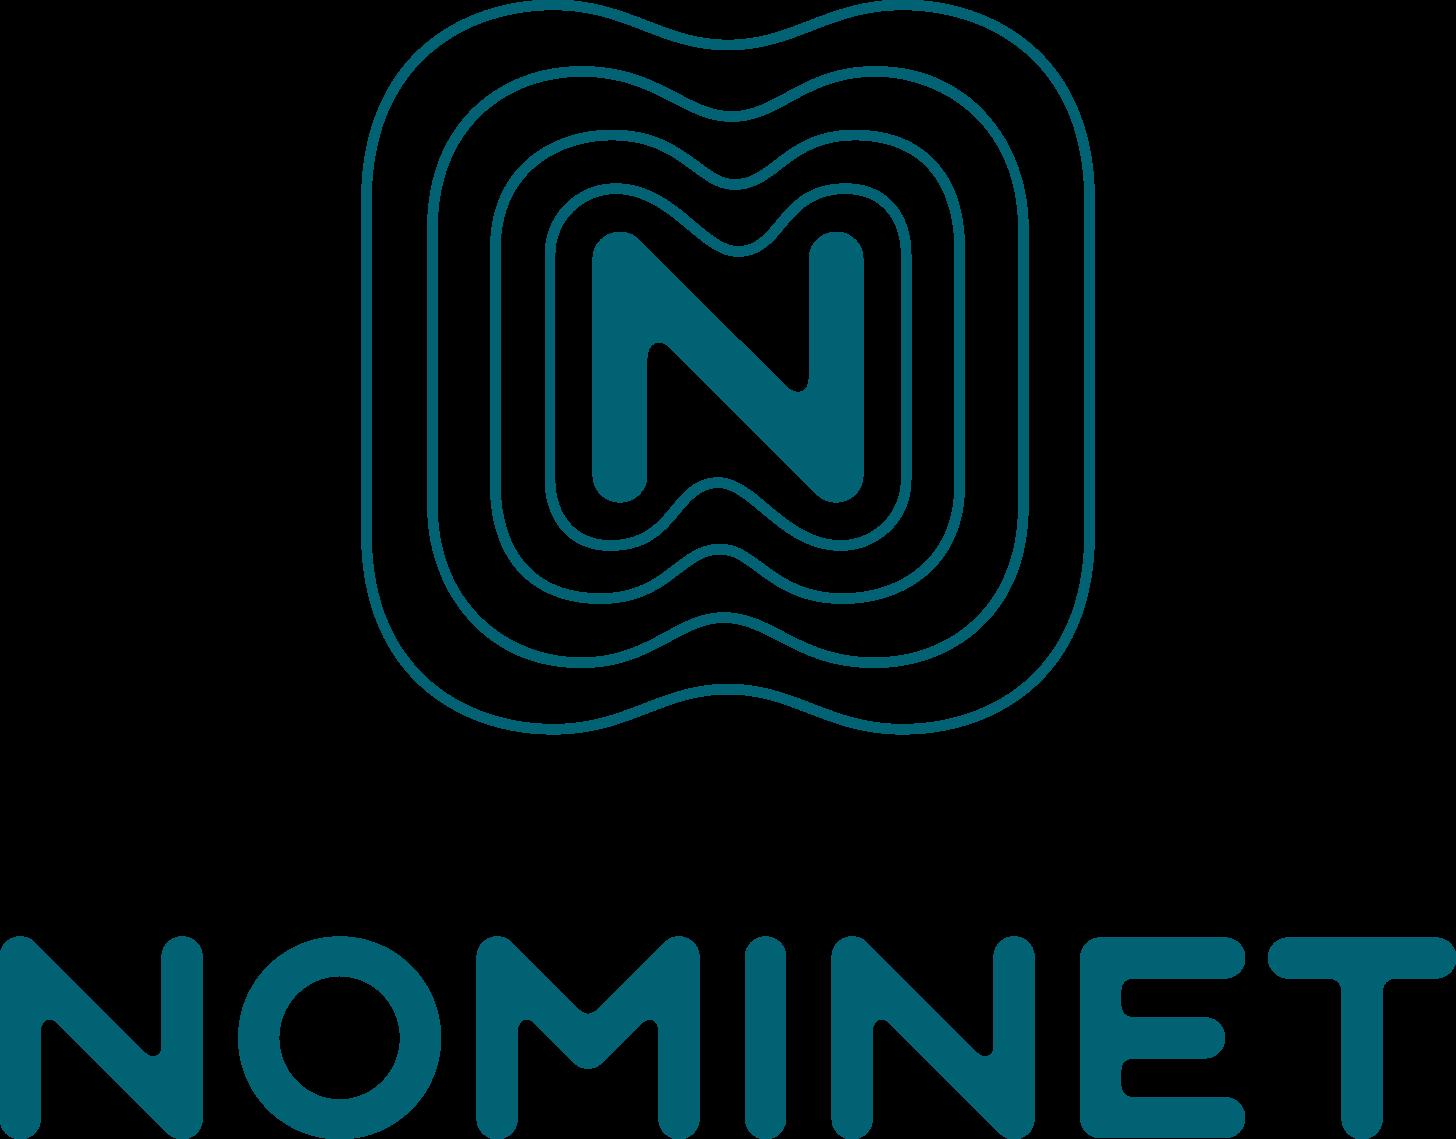 Nominet_Port_RGB_Teal